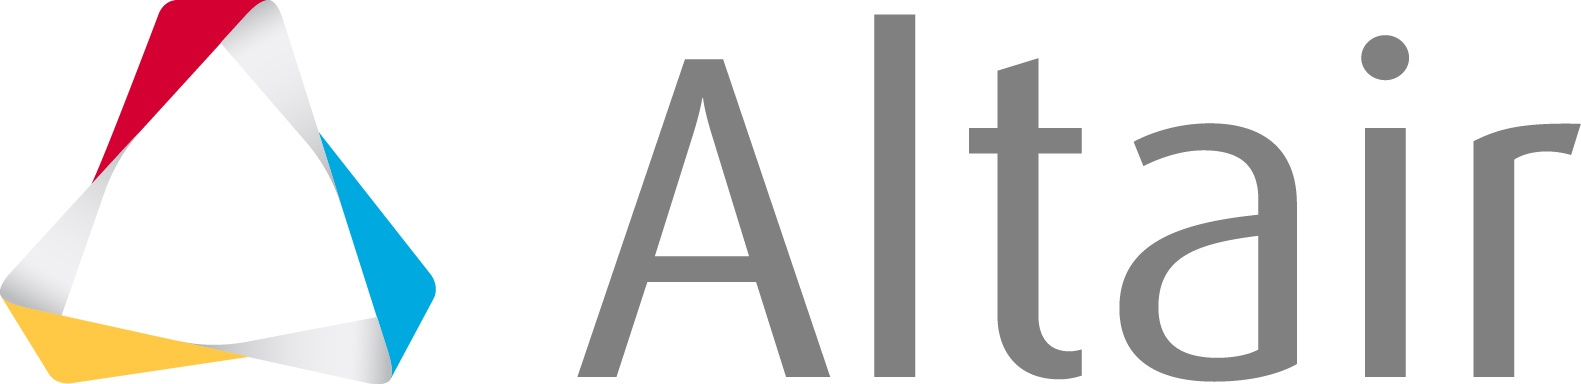 Altair_horizontal_RGB_wout_guides.jpg